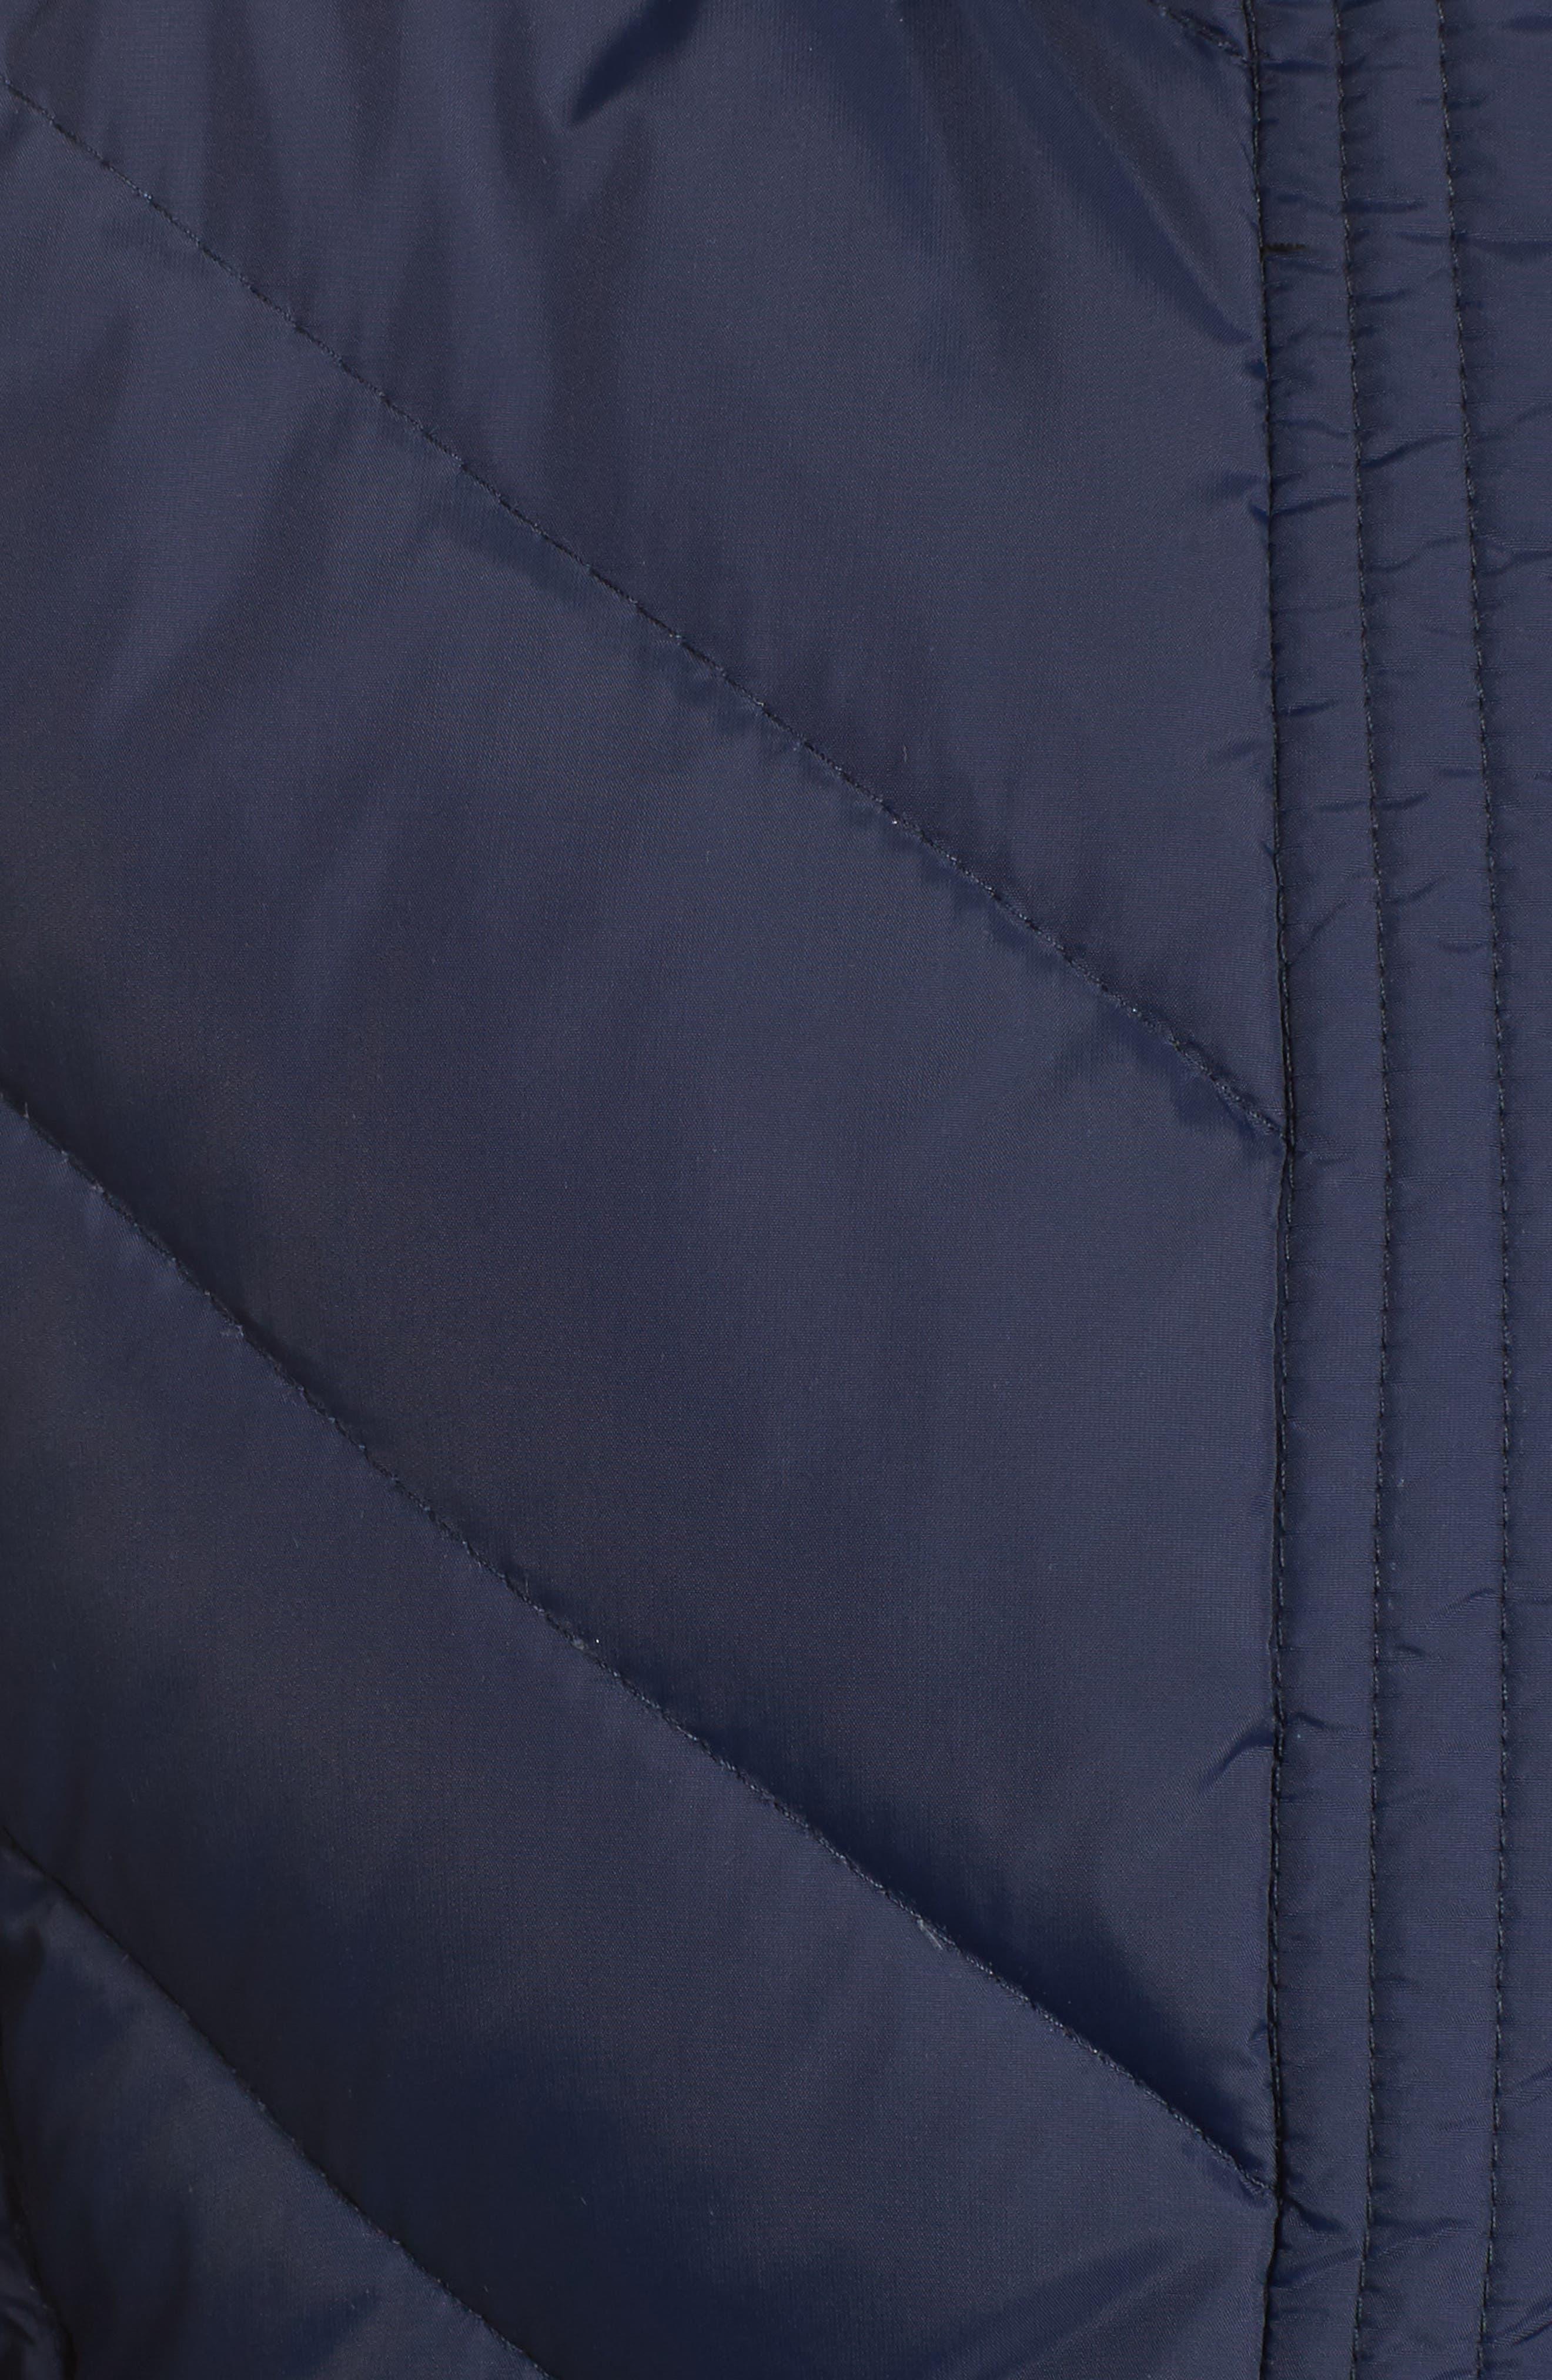 Faux Fur Trim Hooded Jacket,                             Alternate thumbnail 6, color,                             004